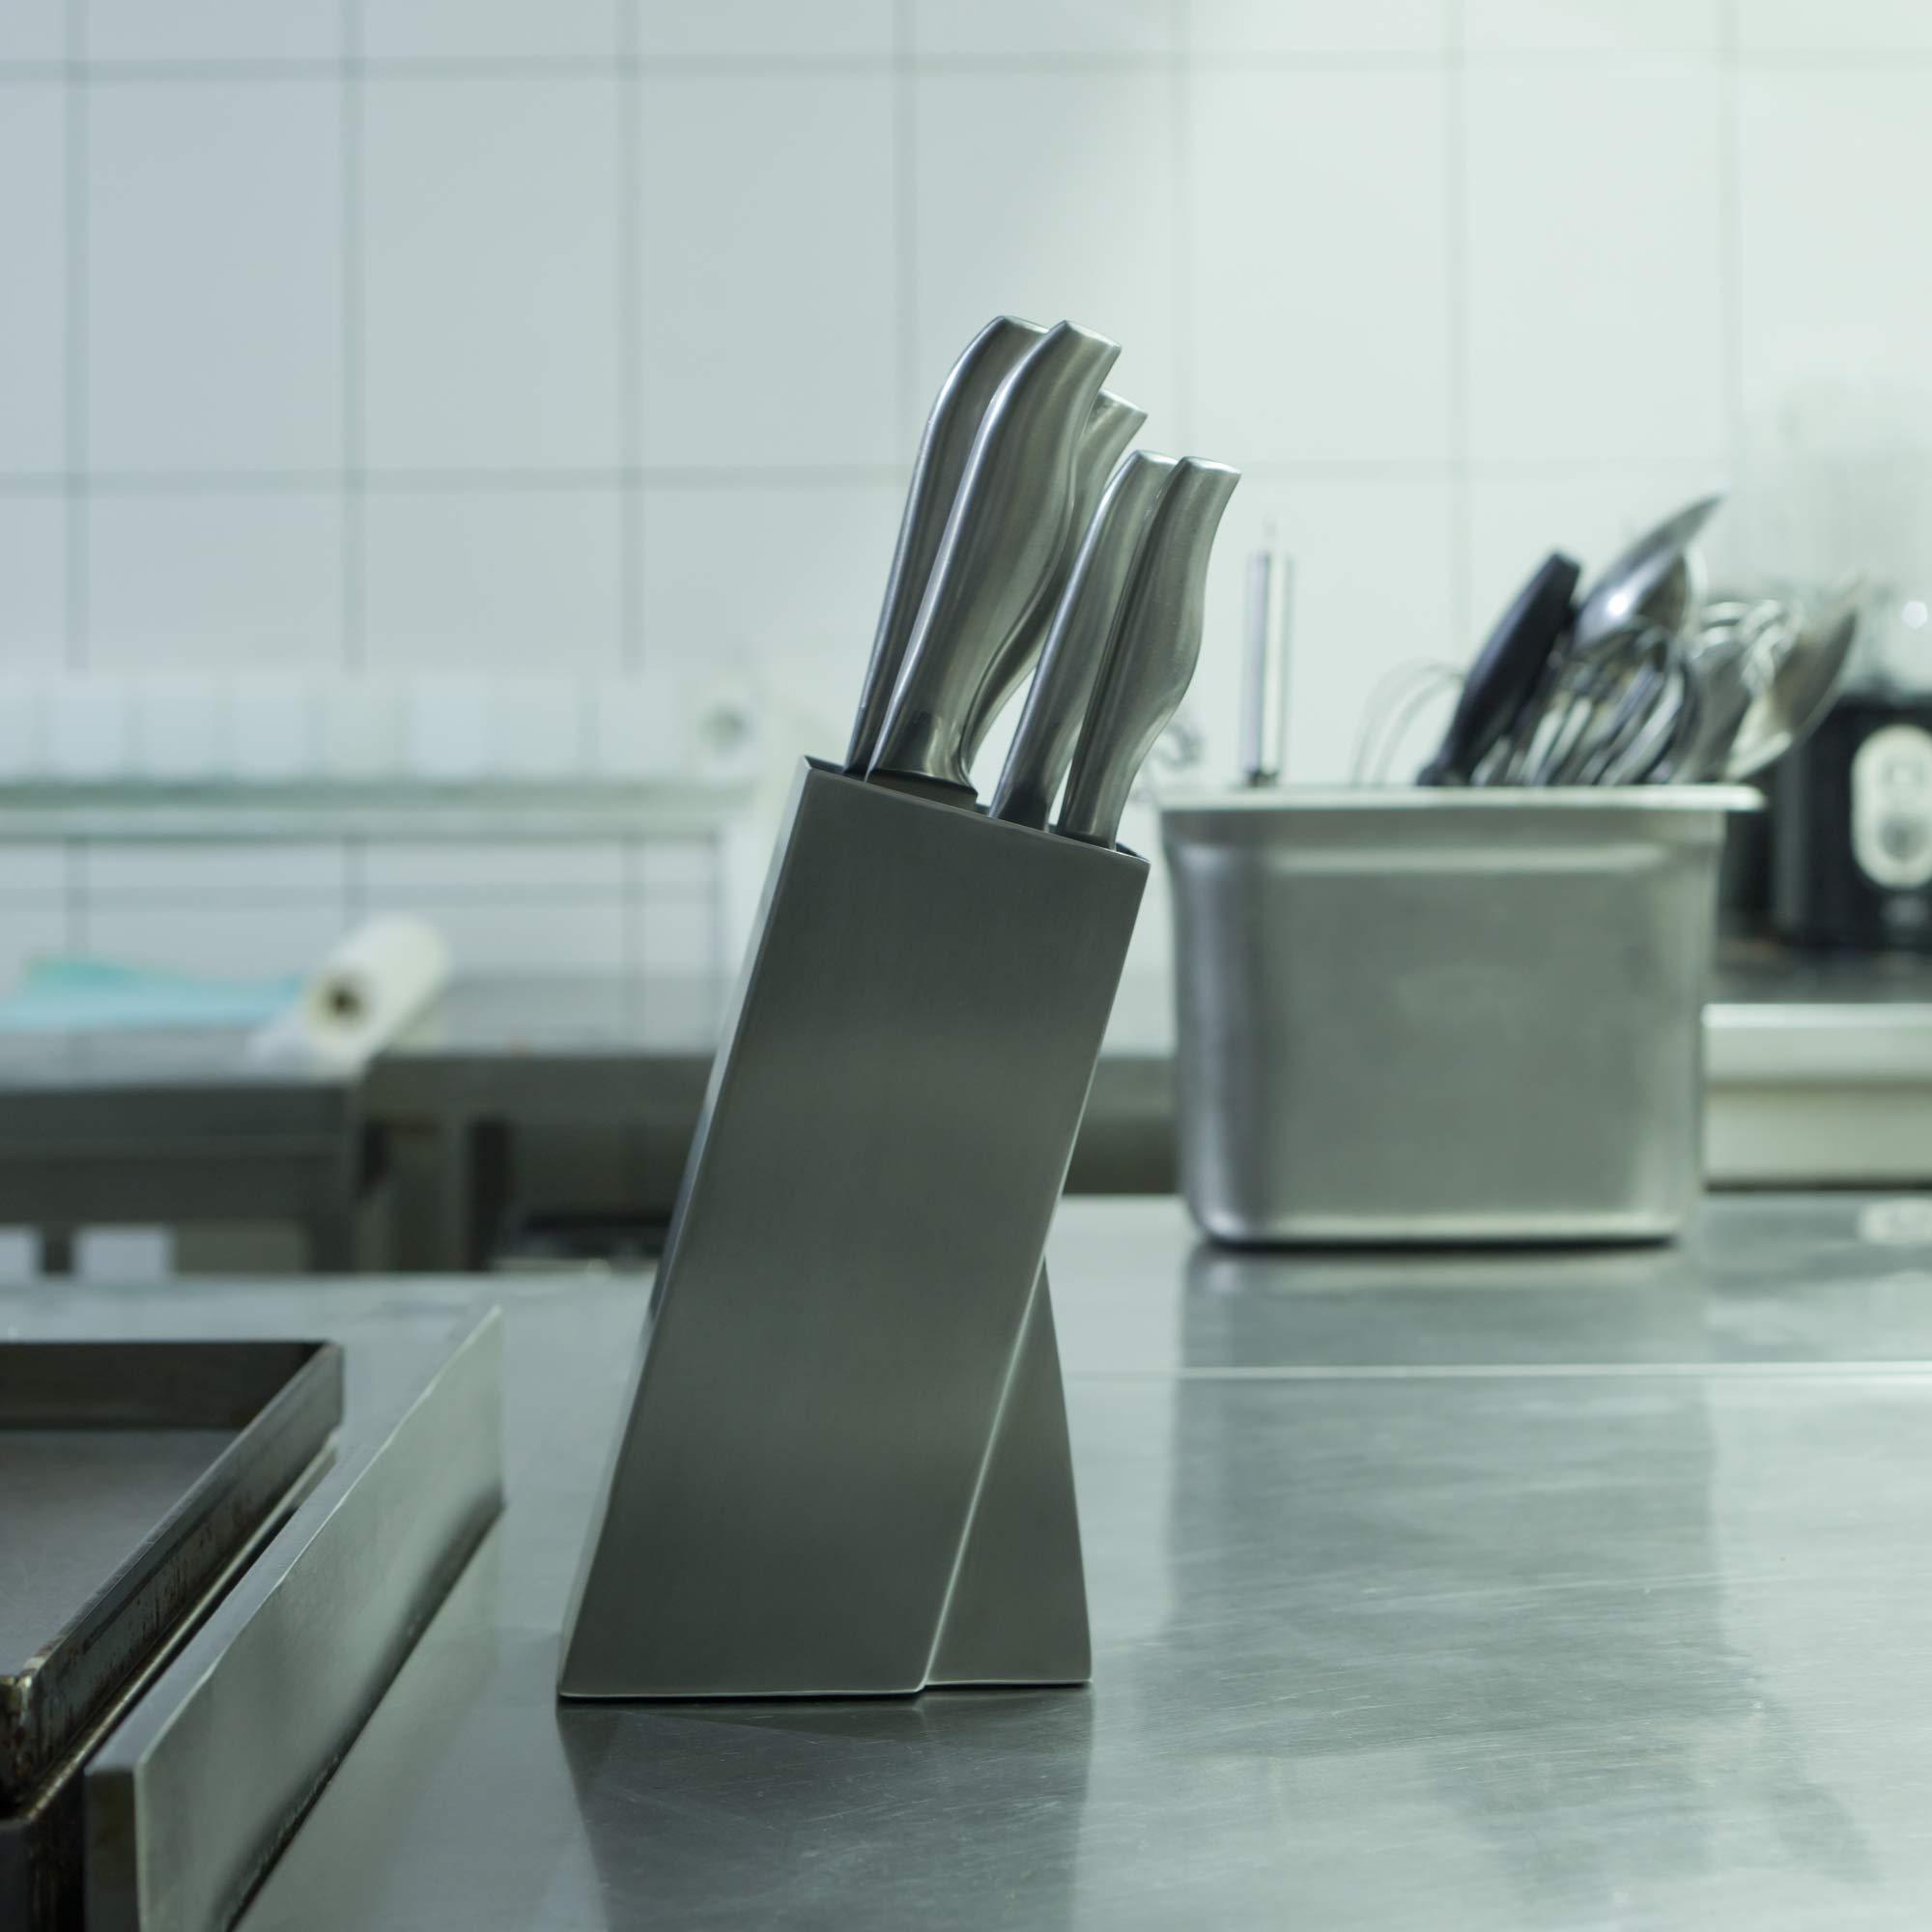 Universal Stainless Steel Knife Block Organizer – For Safe Kitchen Knife Holder Easy Clean Dishwasher Safe – Space Saver Knife Storage Stand by Leeffood (Image #7)